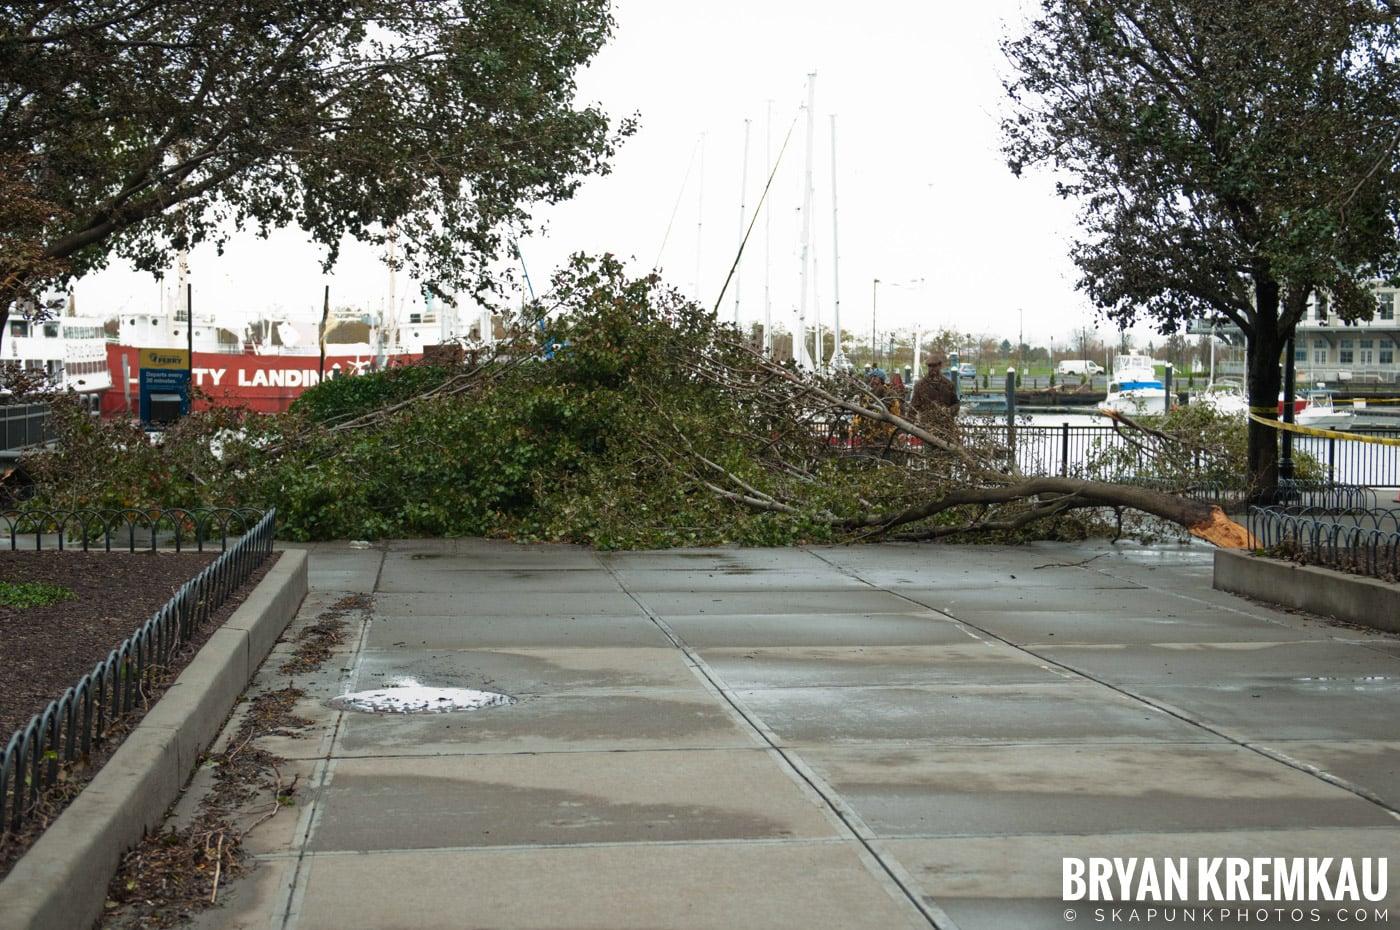 Hurricane Sandy 2012 @ Paulus Hook, Jersey City - 10.29.12 - 10.30.12 (25)